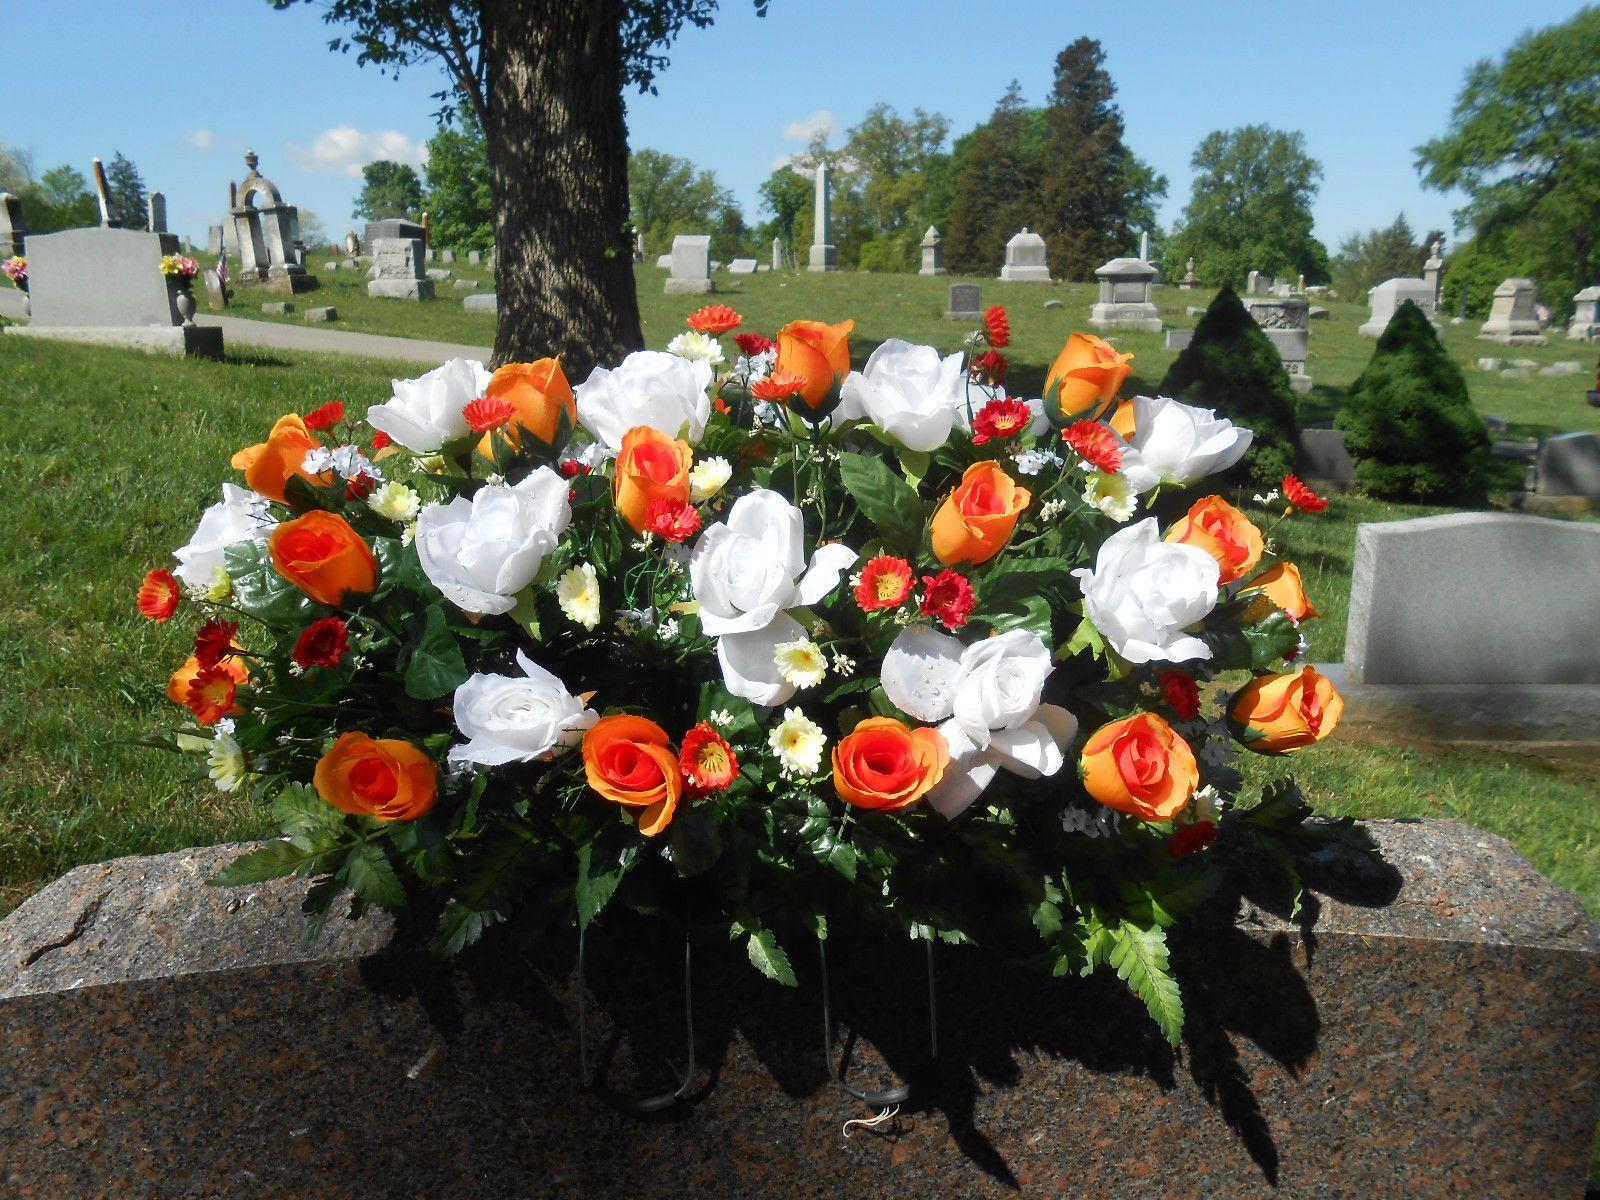 Cemetery silk flower headstone tombstone memorial saddle grave cemetery silk flower headstone tombstone memorial saddle grave orange and white picclick mightylinksfo Choice Image